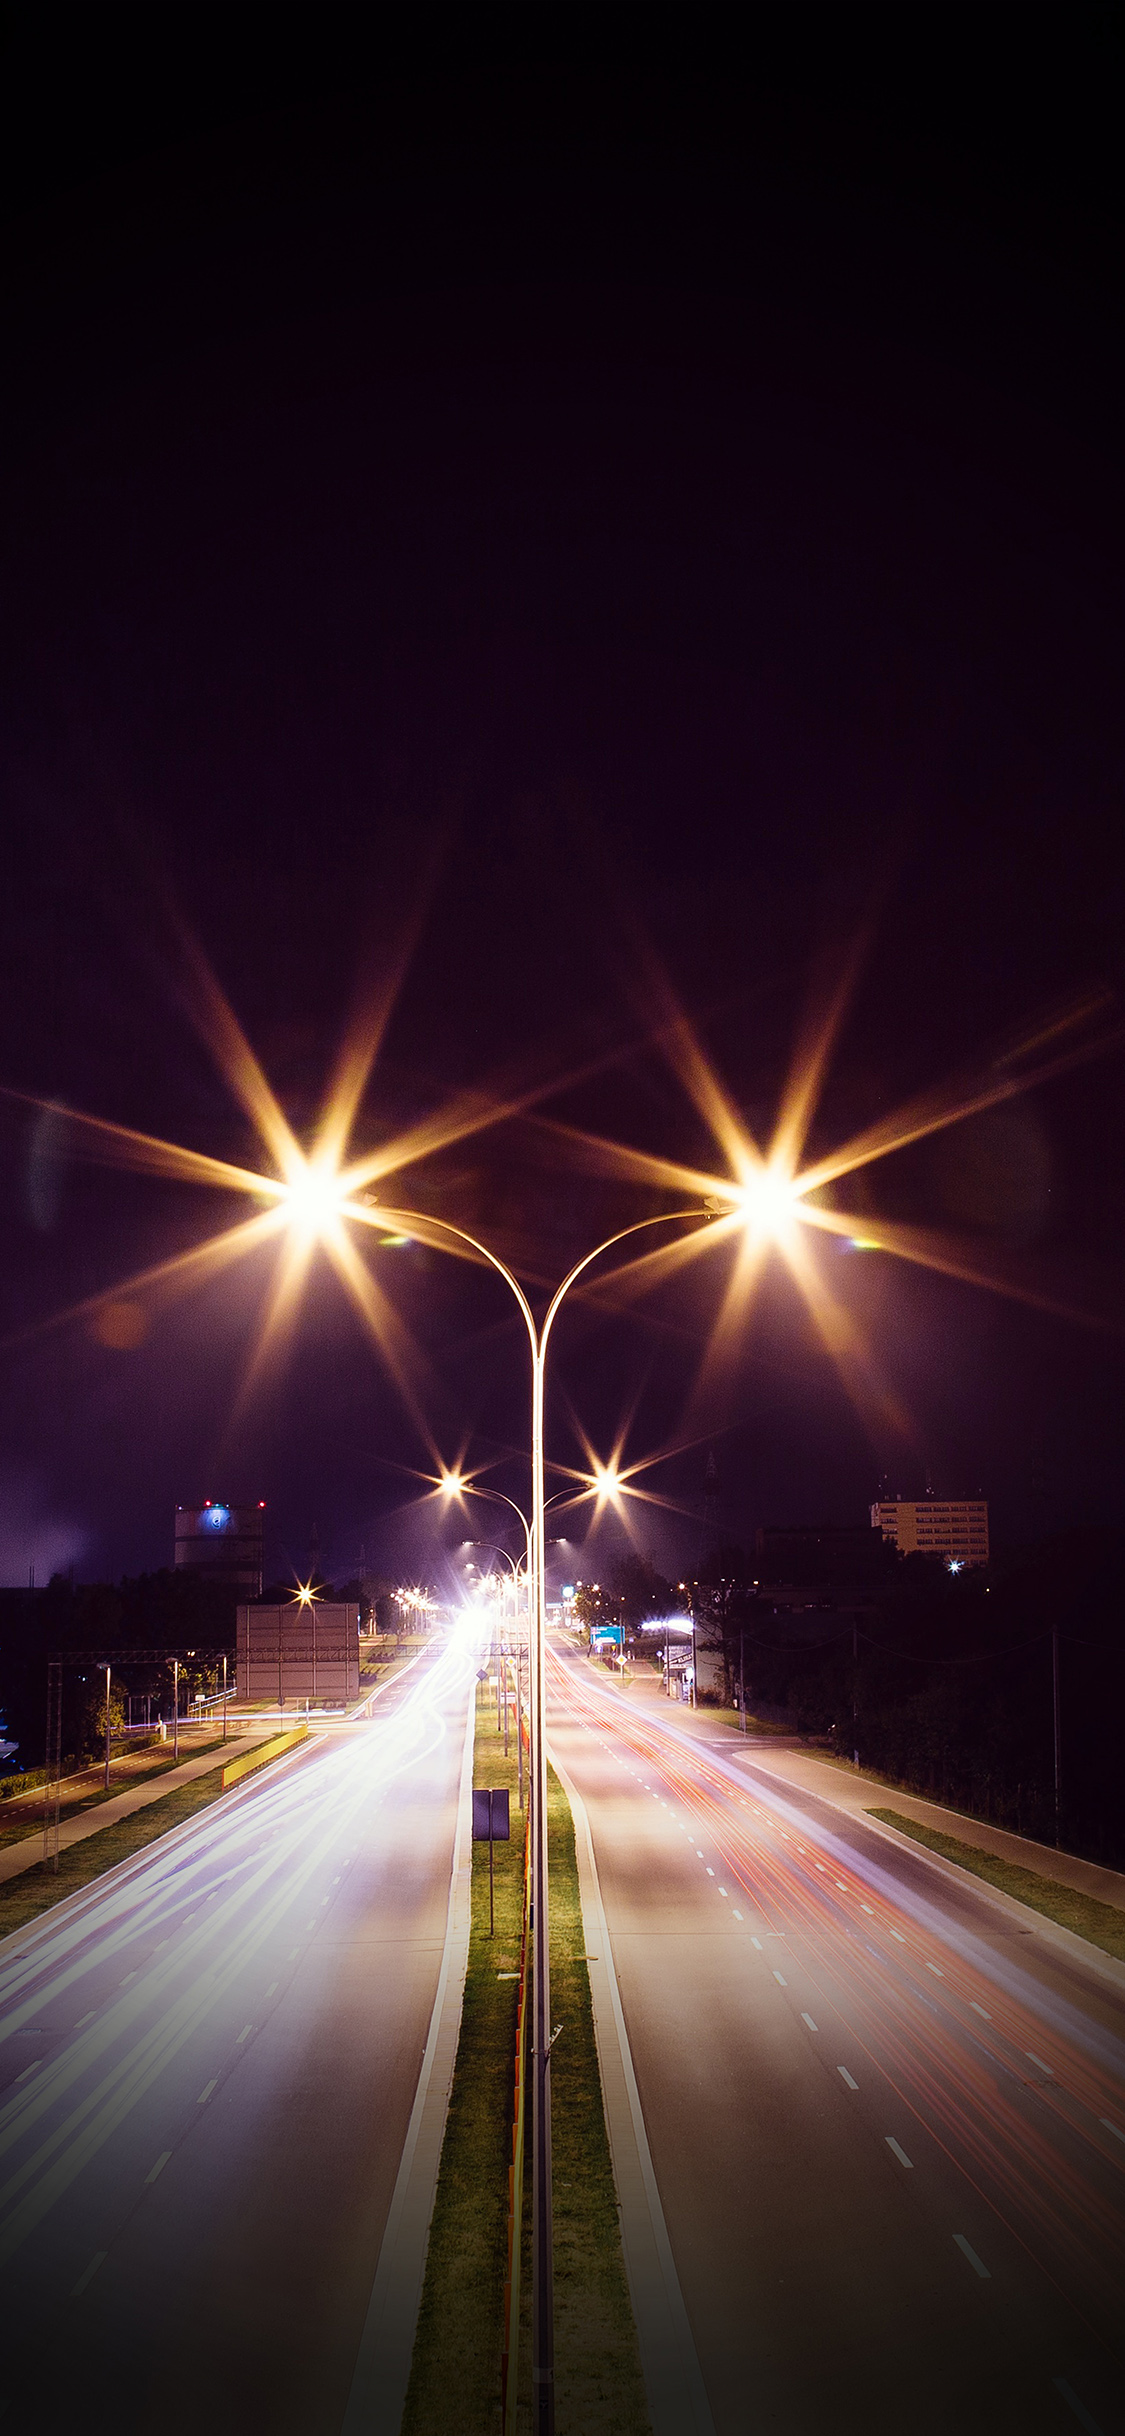 iPhoneXpapers.com-Apple-iPhone-wallpaper-mw69-night-road-exposure-dark-light-city-car-vignette